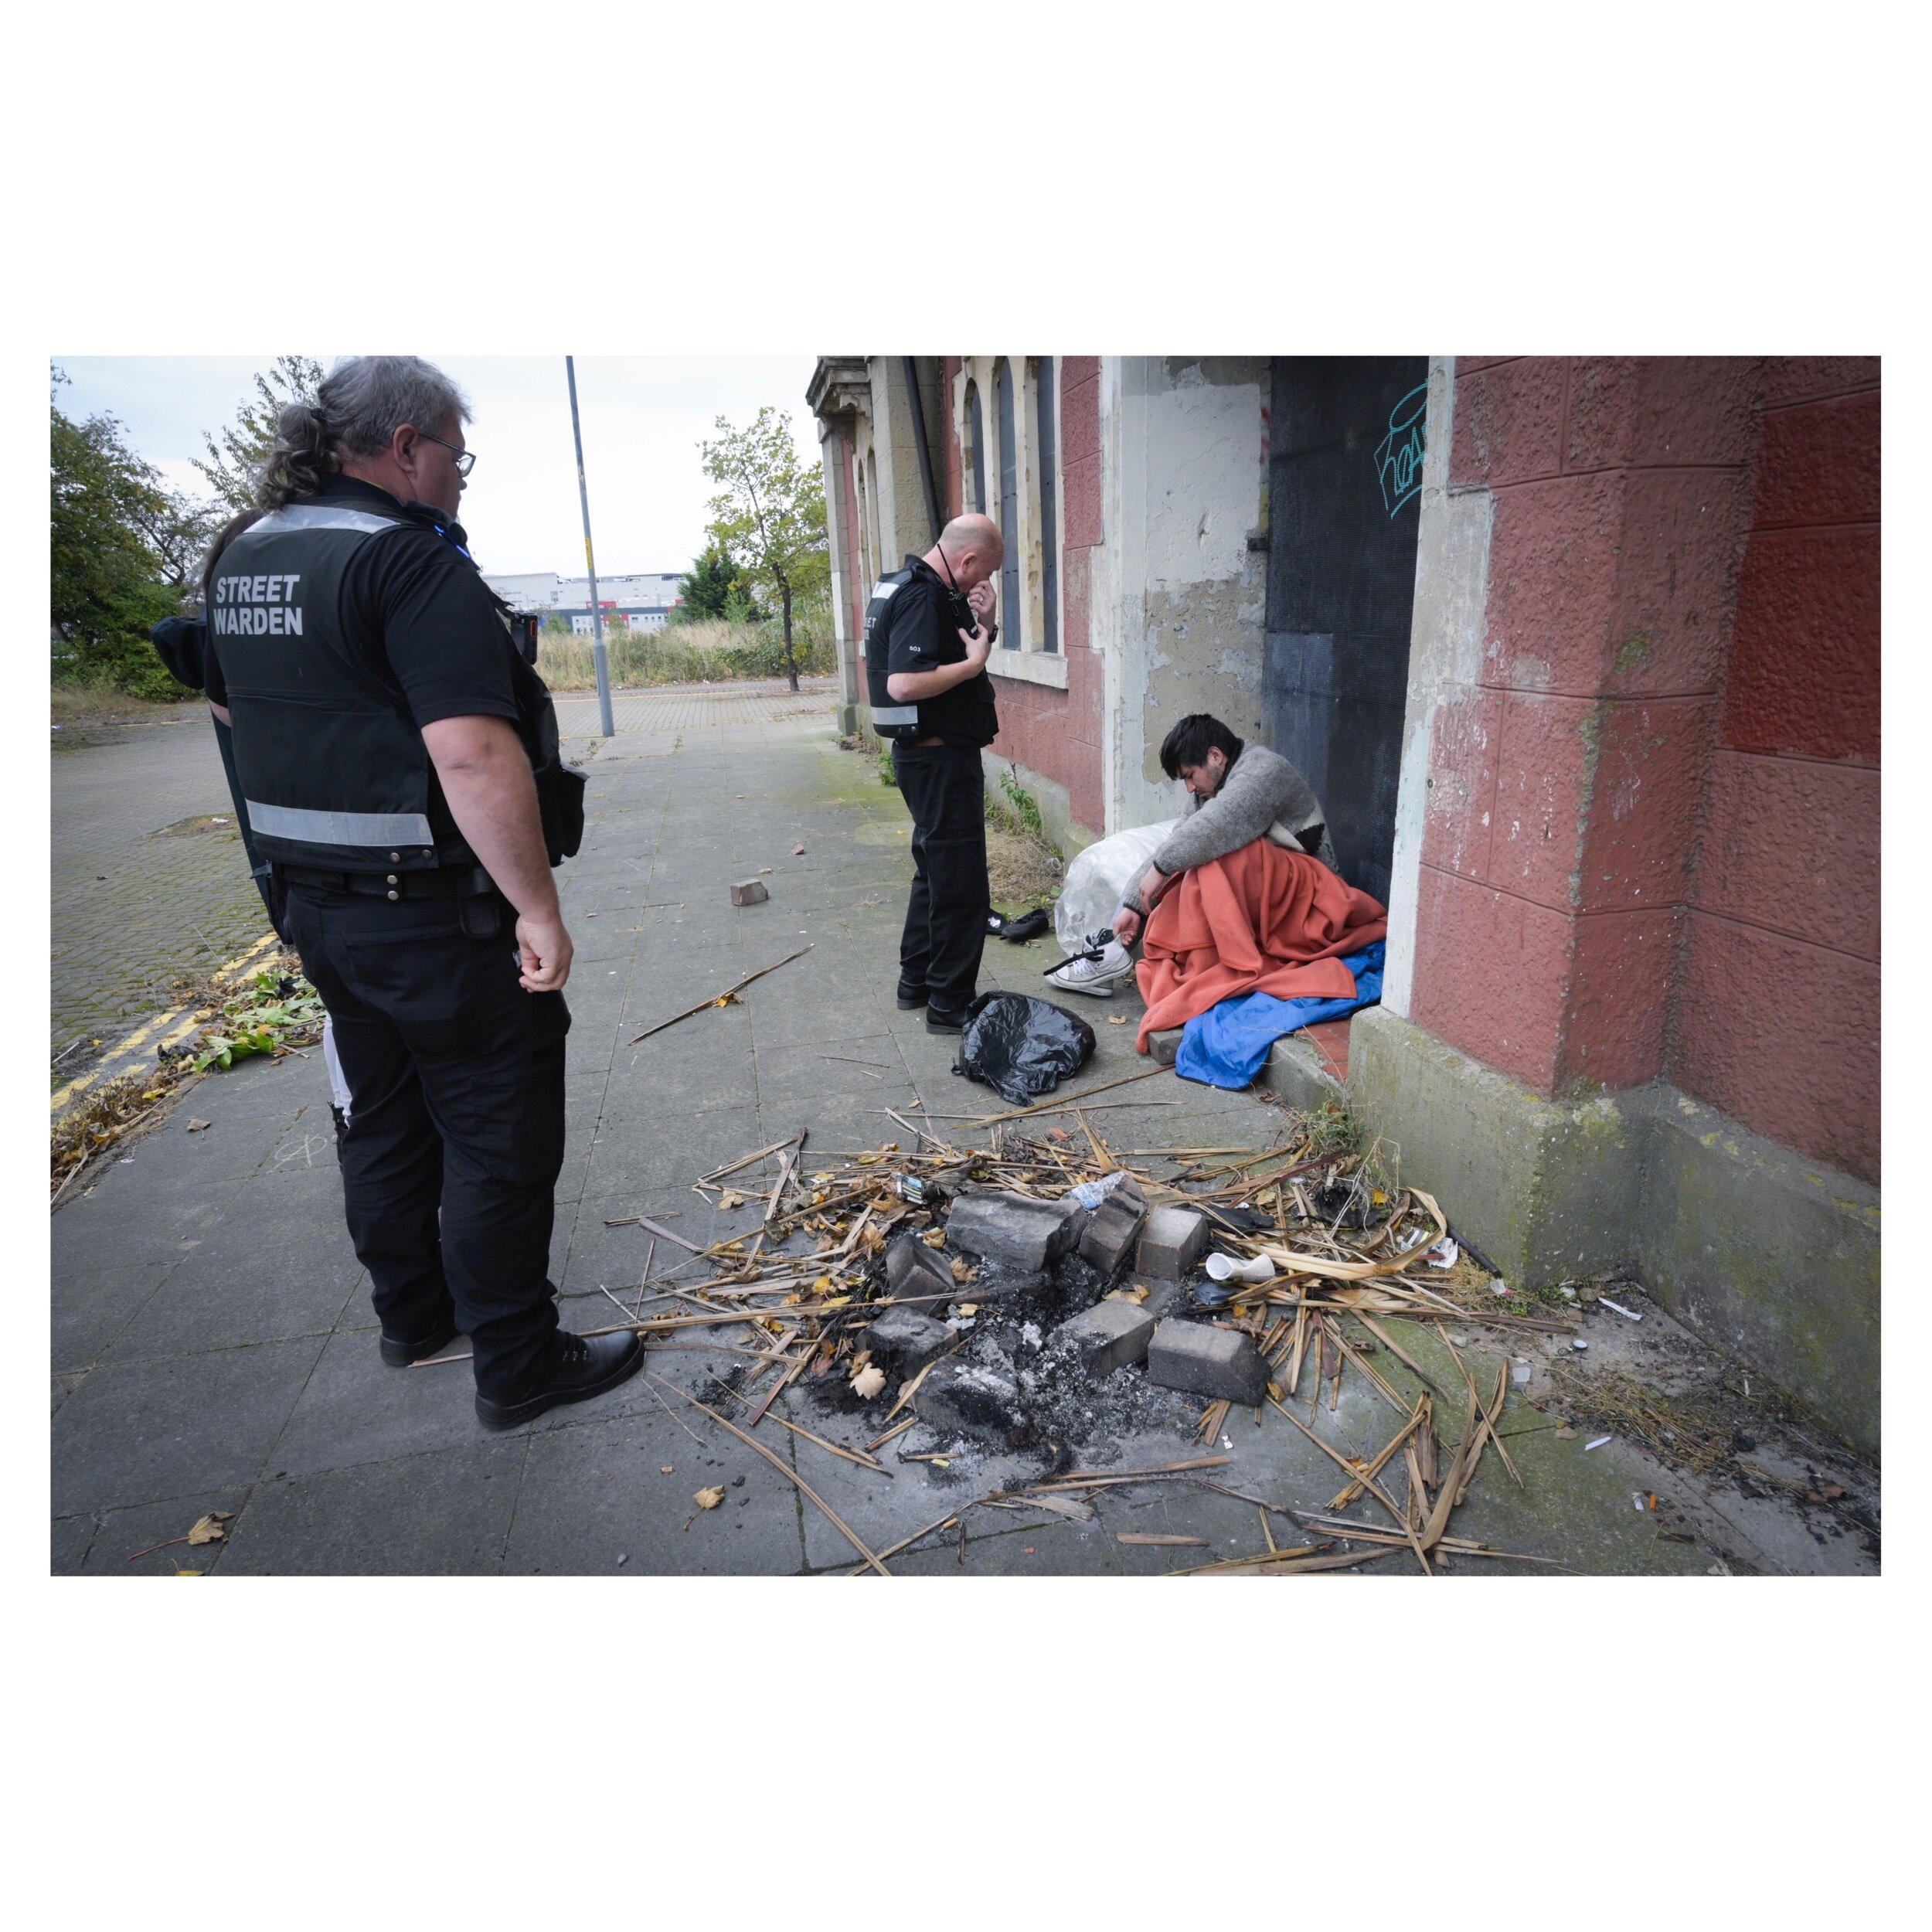 Middlesborough Street wardens